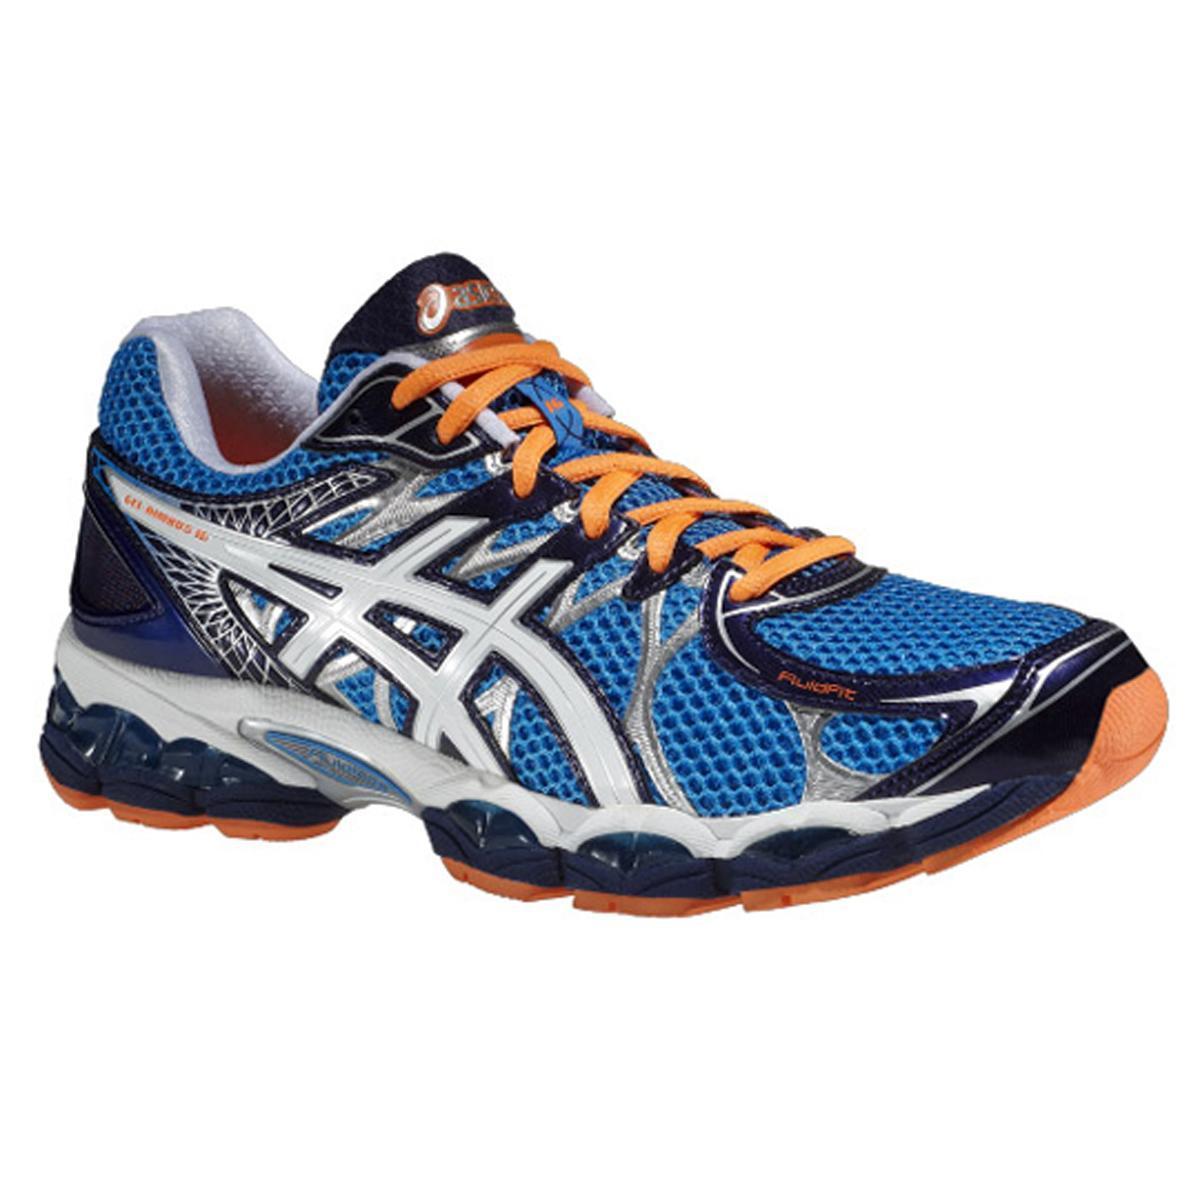 Asics Mens GEL Nimbus 16 Running Shoes BlueWhite